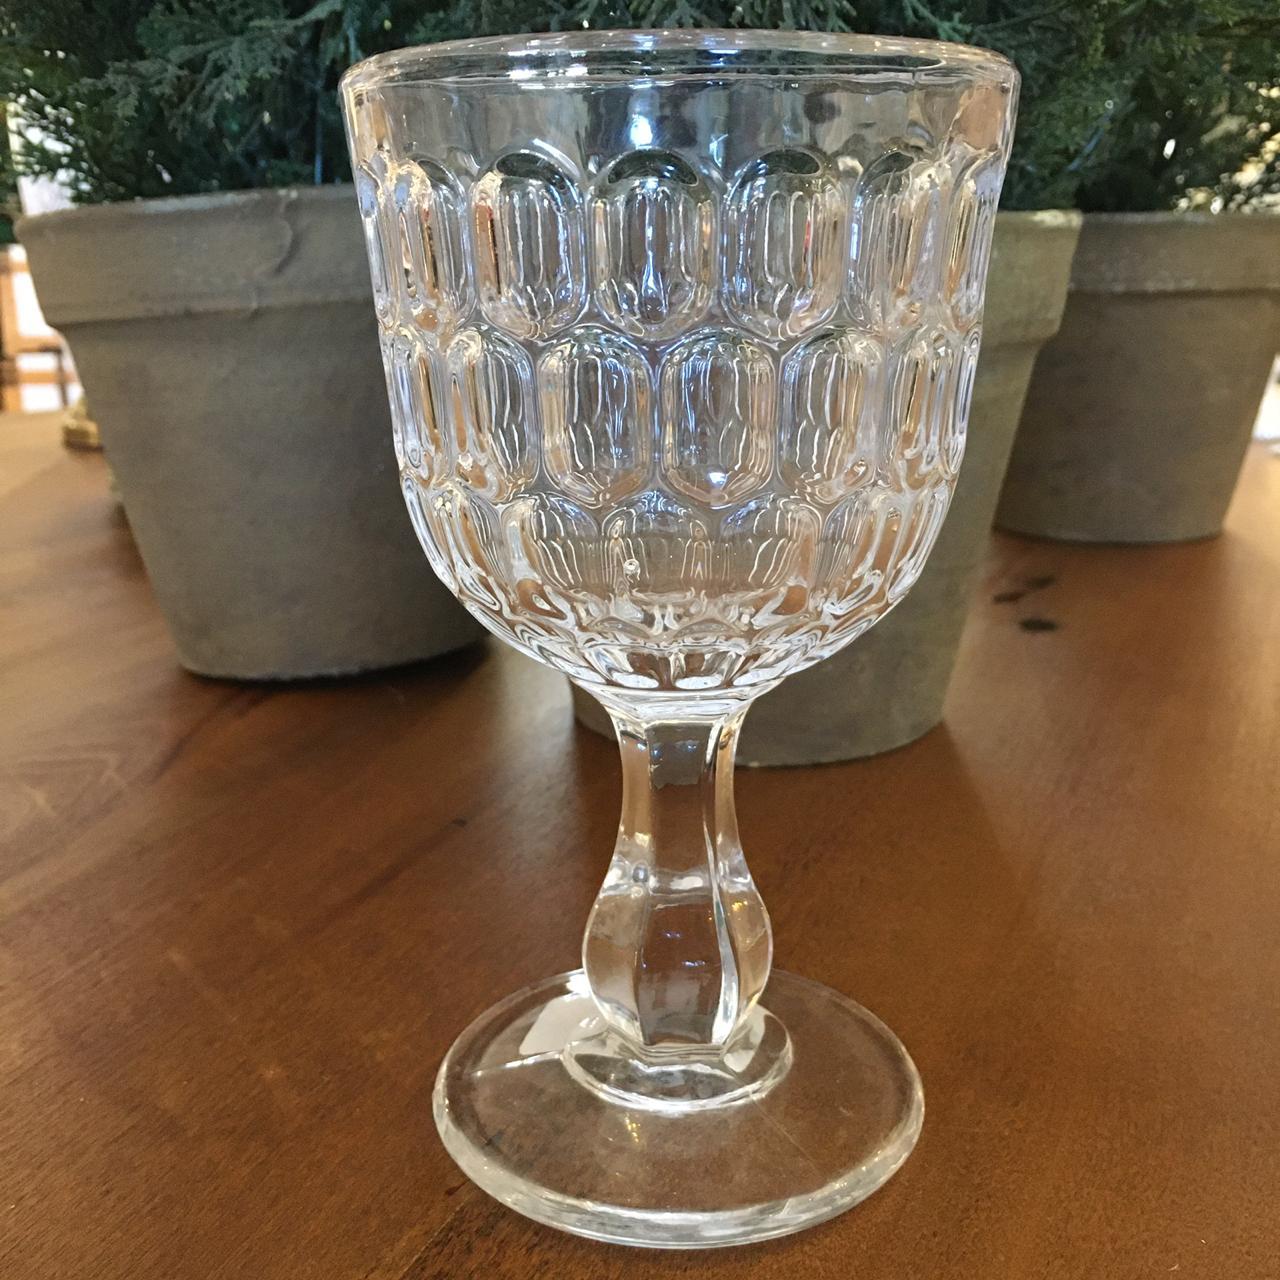 Kit 6 Taças para Água de Vidro Transparente BTC 300ml  - Lemis